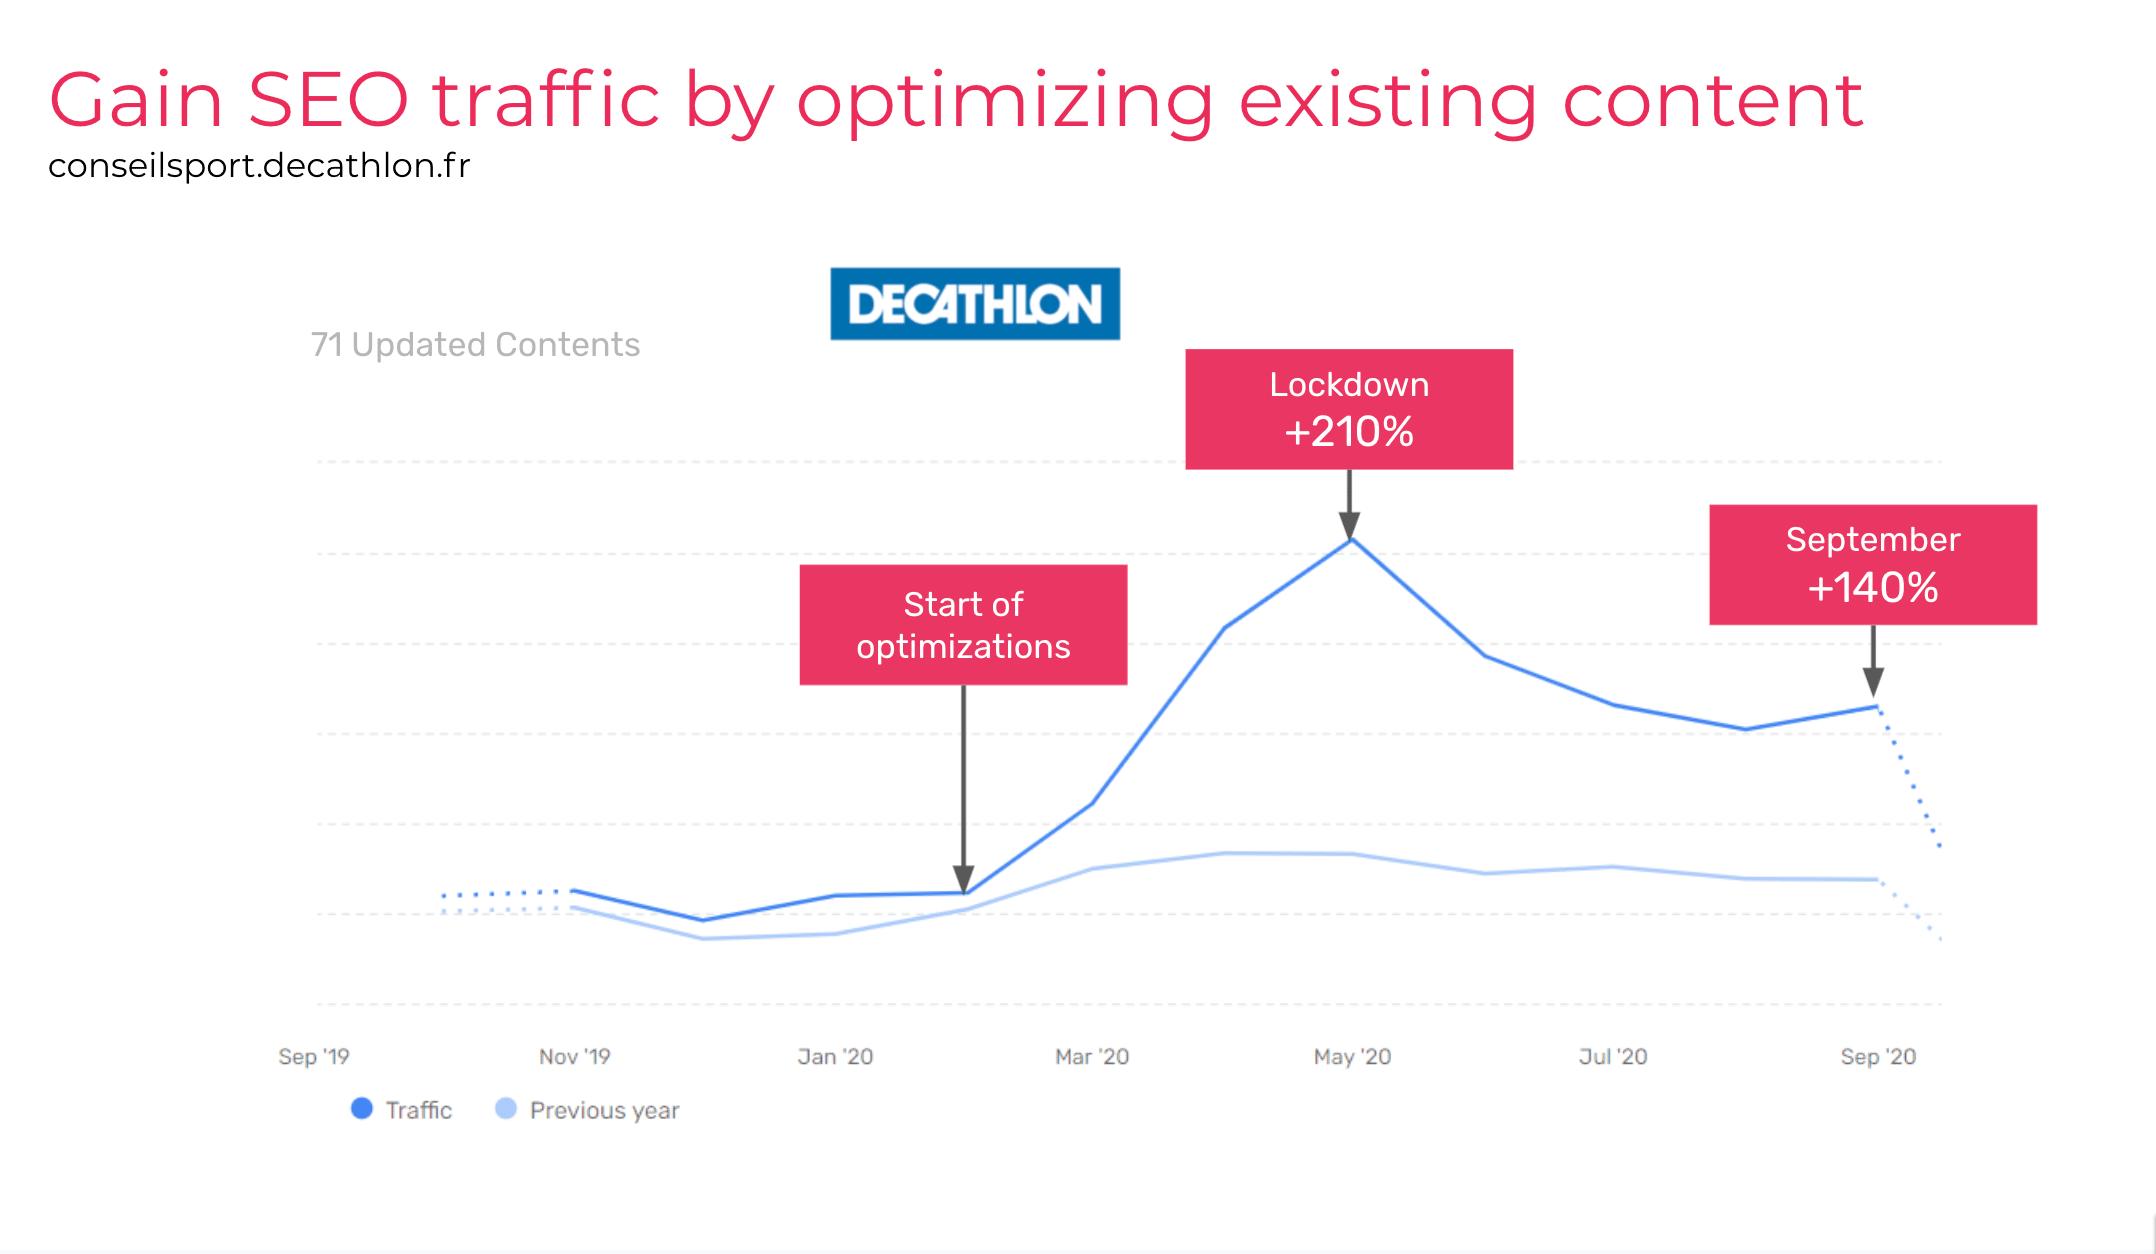 Gain de trafic SEO en optimisant les contenus existants